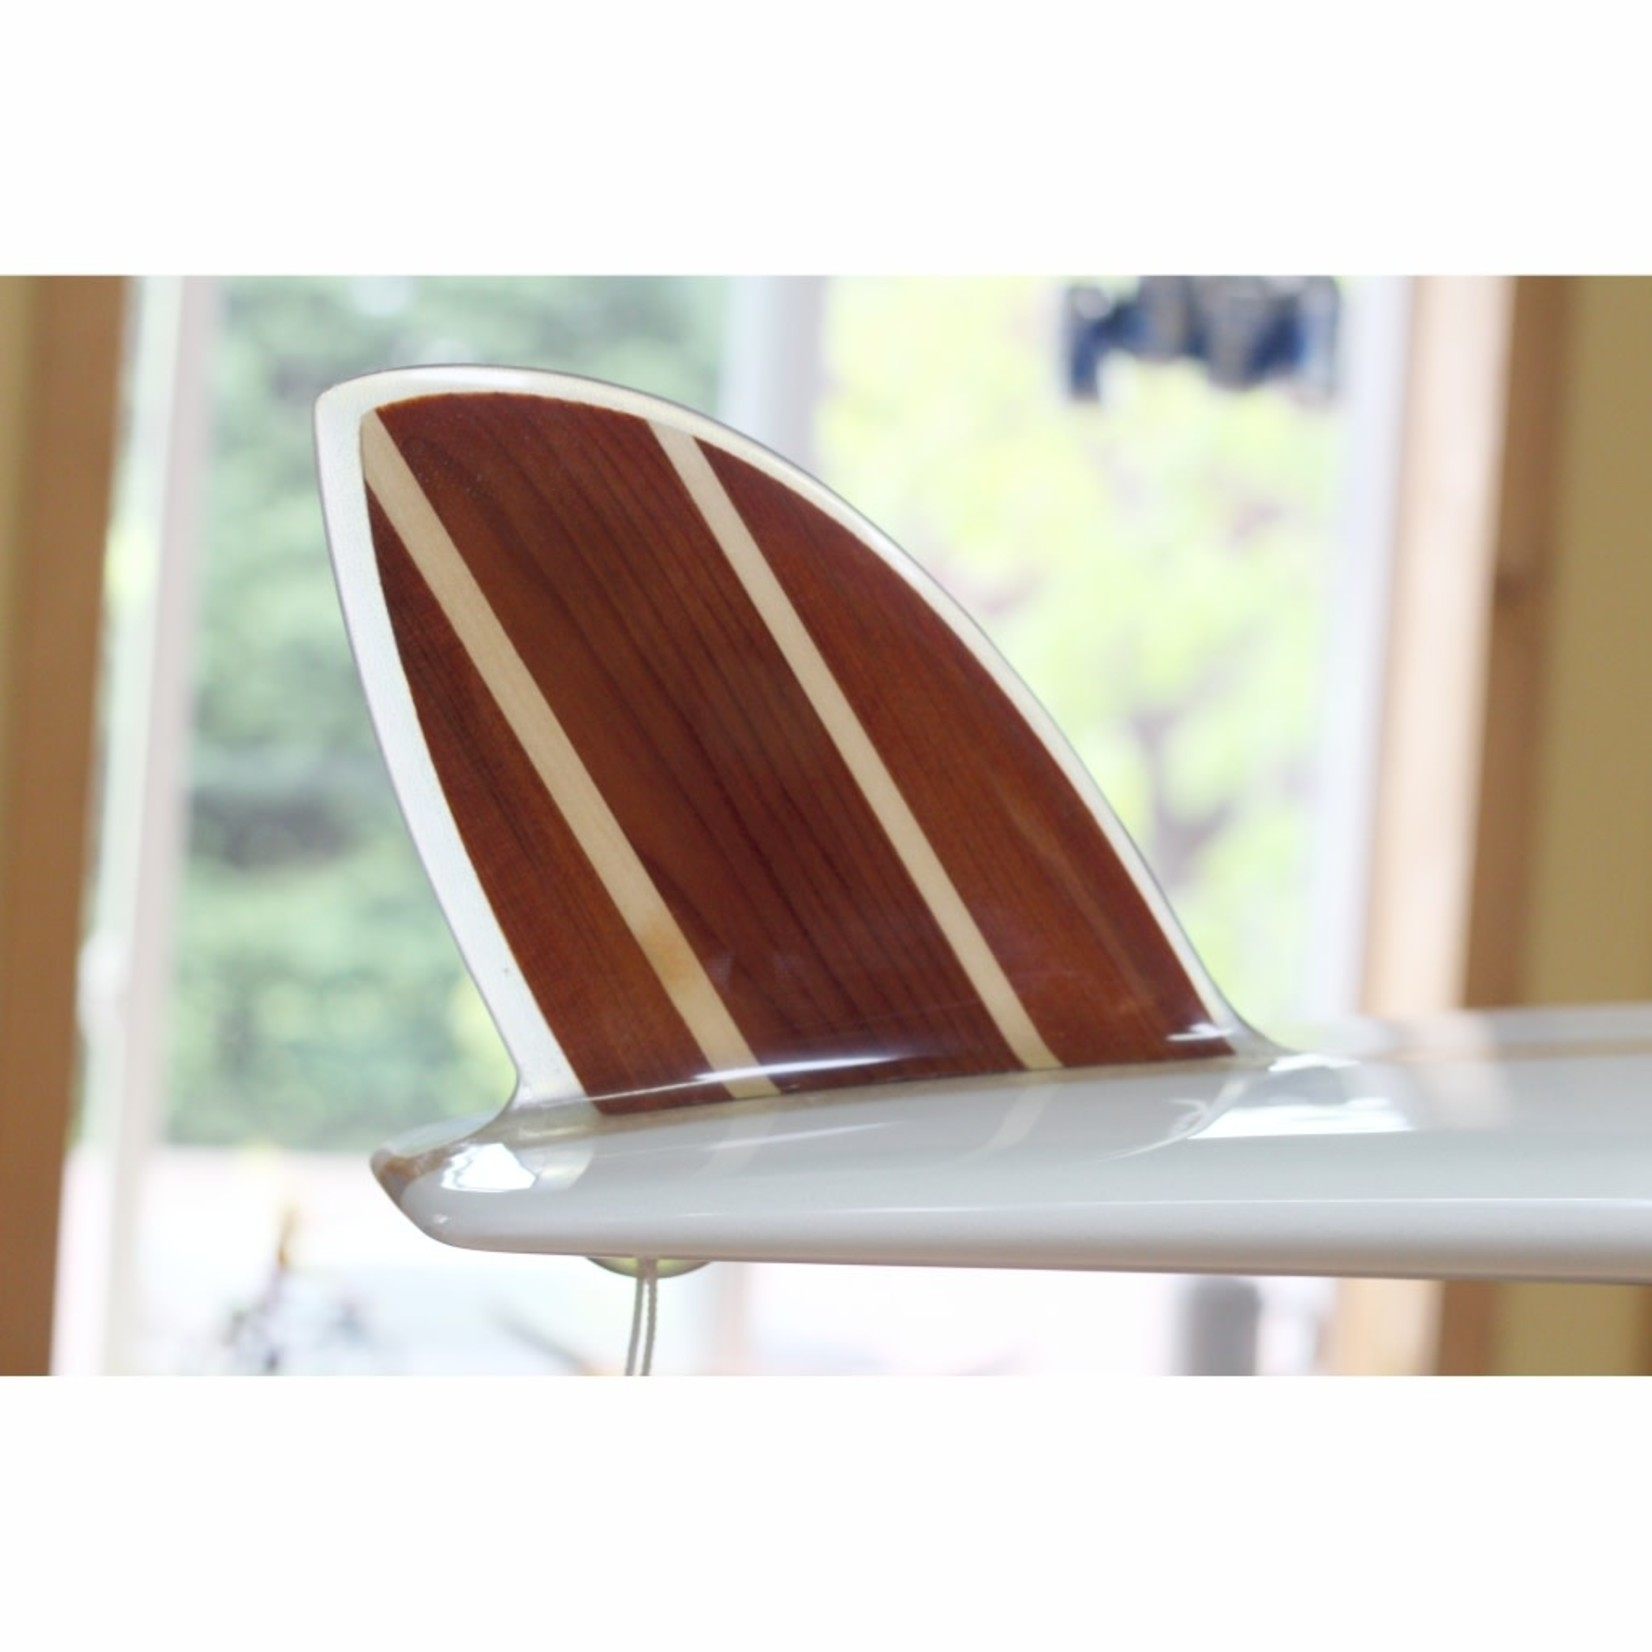 "Island Surf Company 9'6 Island Surf Company Art Series ""Surf 'n Turf"" Single Fin Pig Longboard."